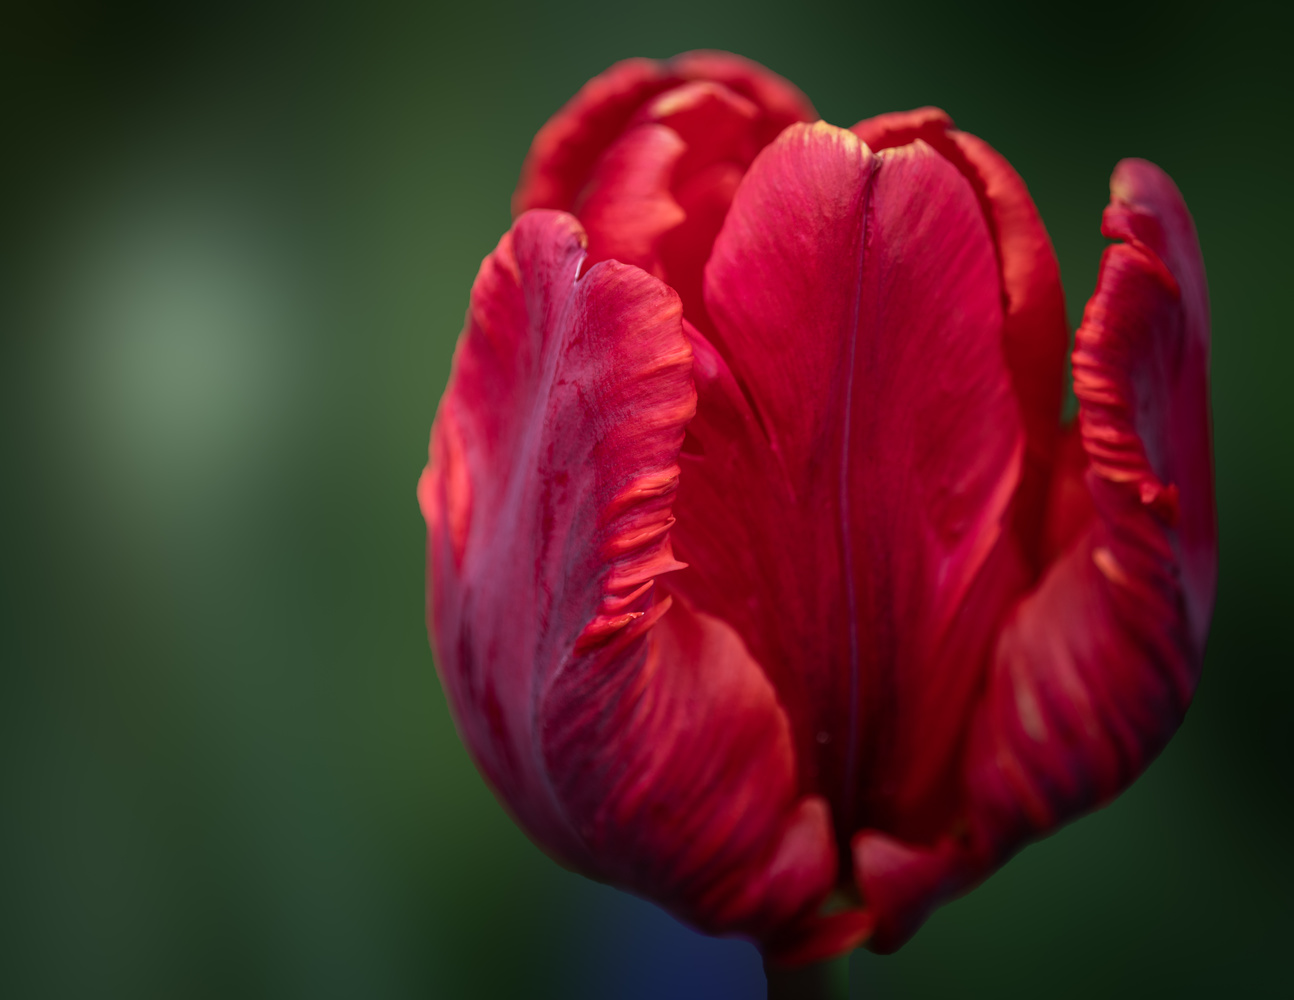 Tulip by Skyler Ewing